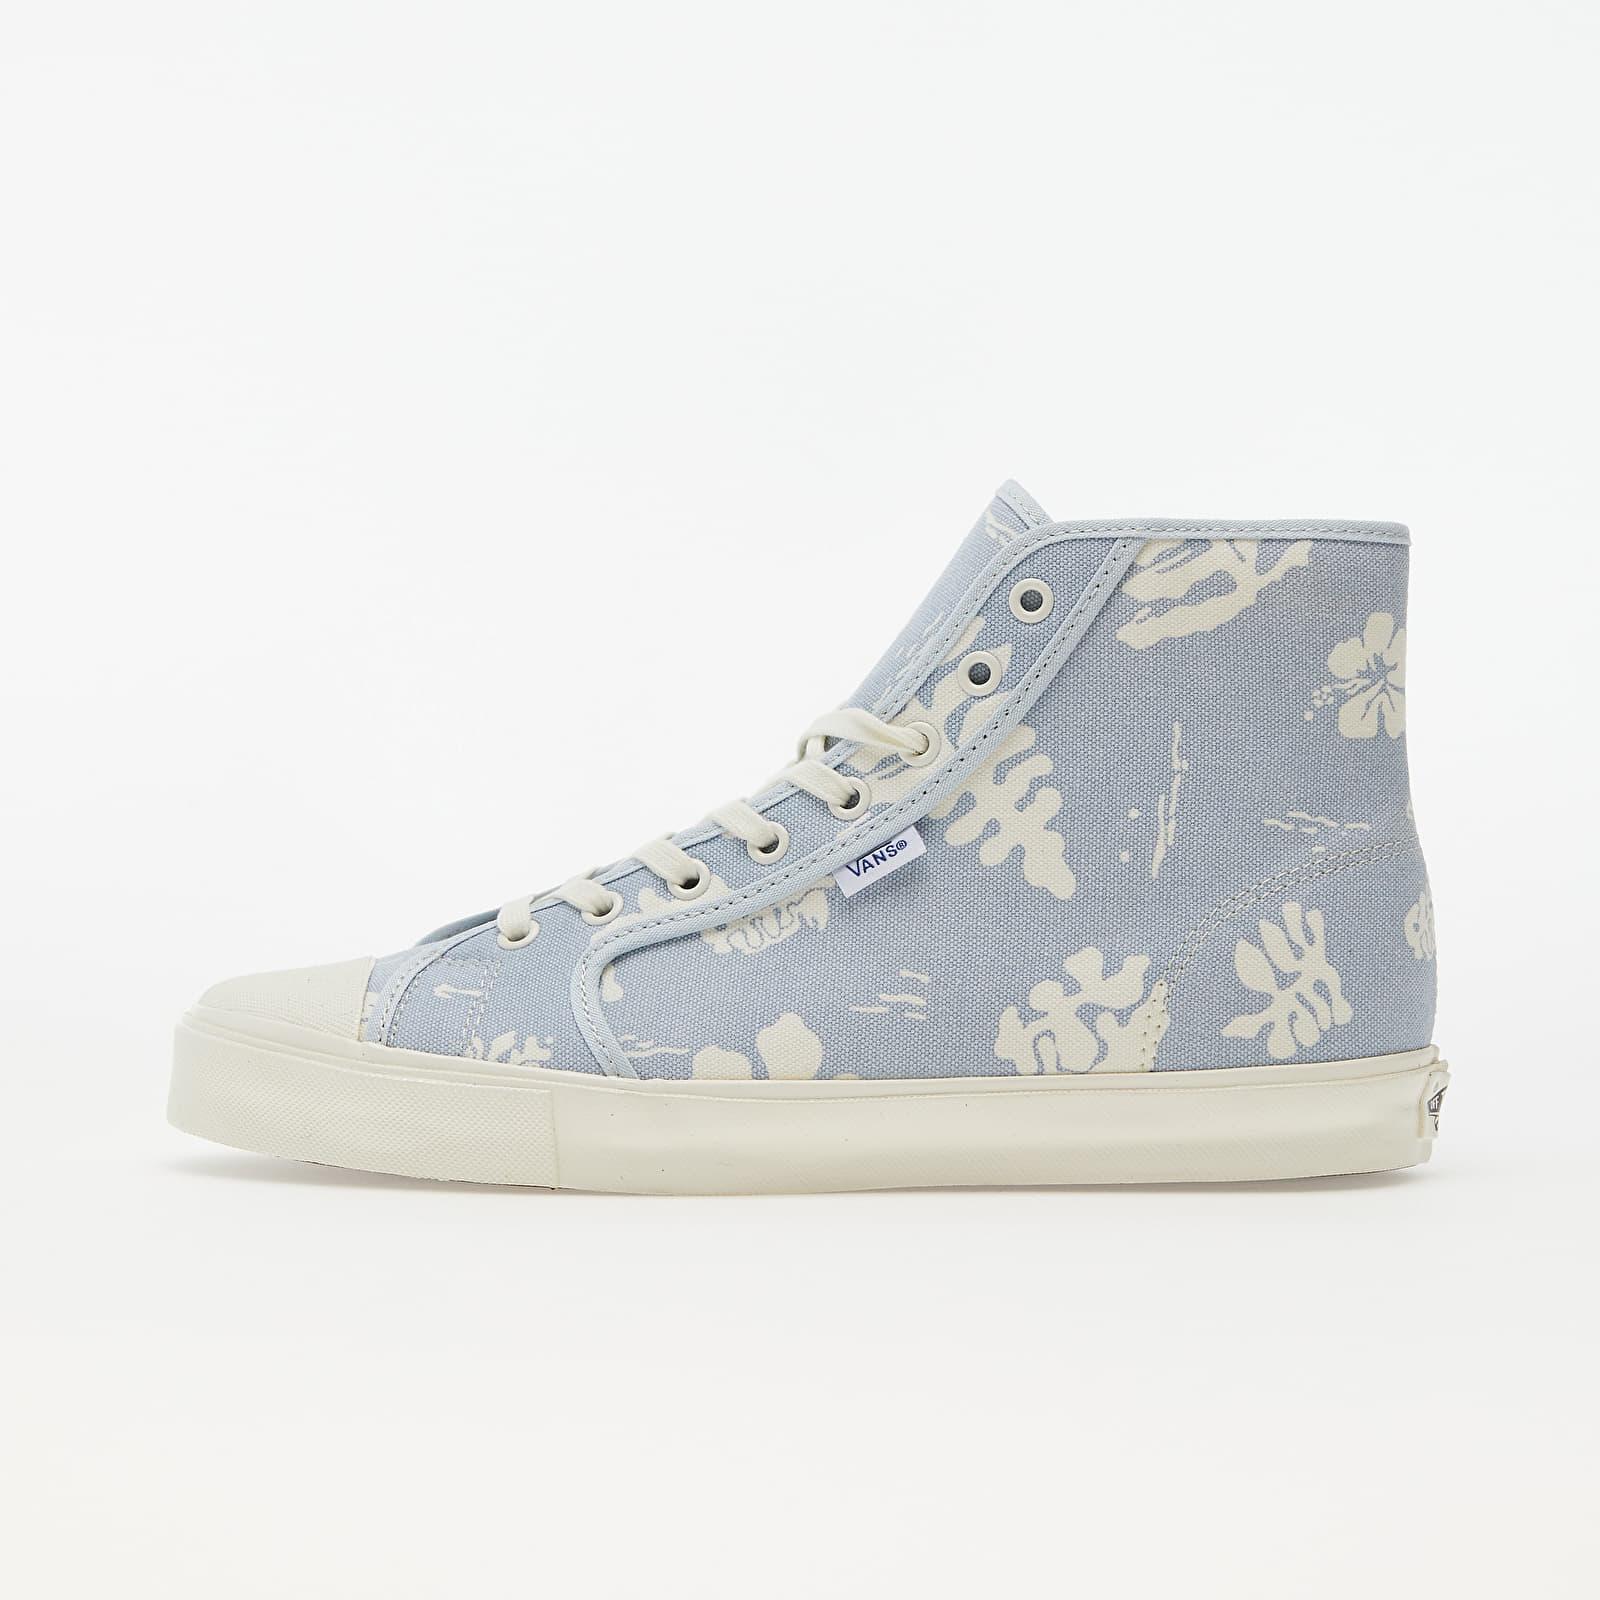 Vans Vault OG Style 24 LX (Canvas) Hibiscus/ Blue VN0A5HUT4O61